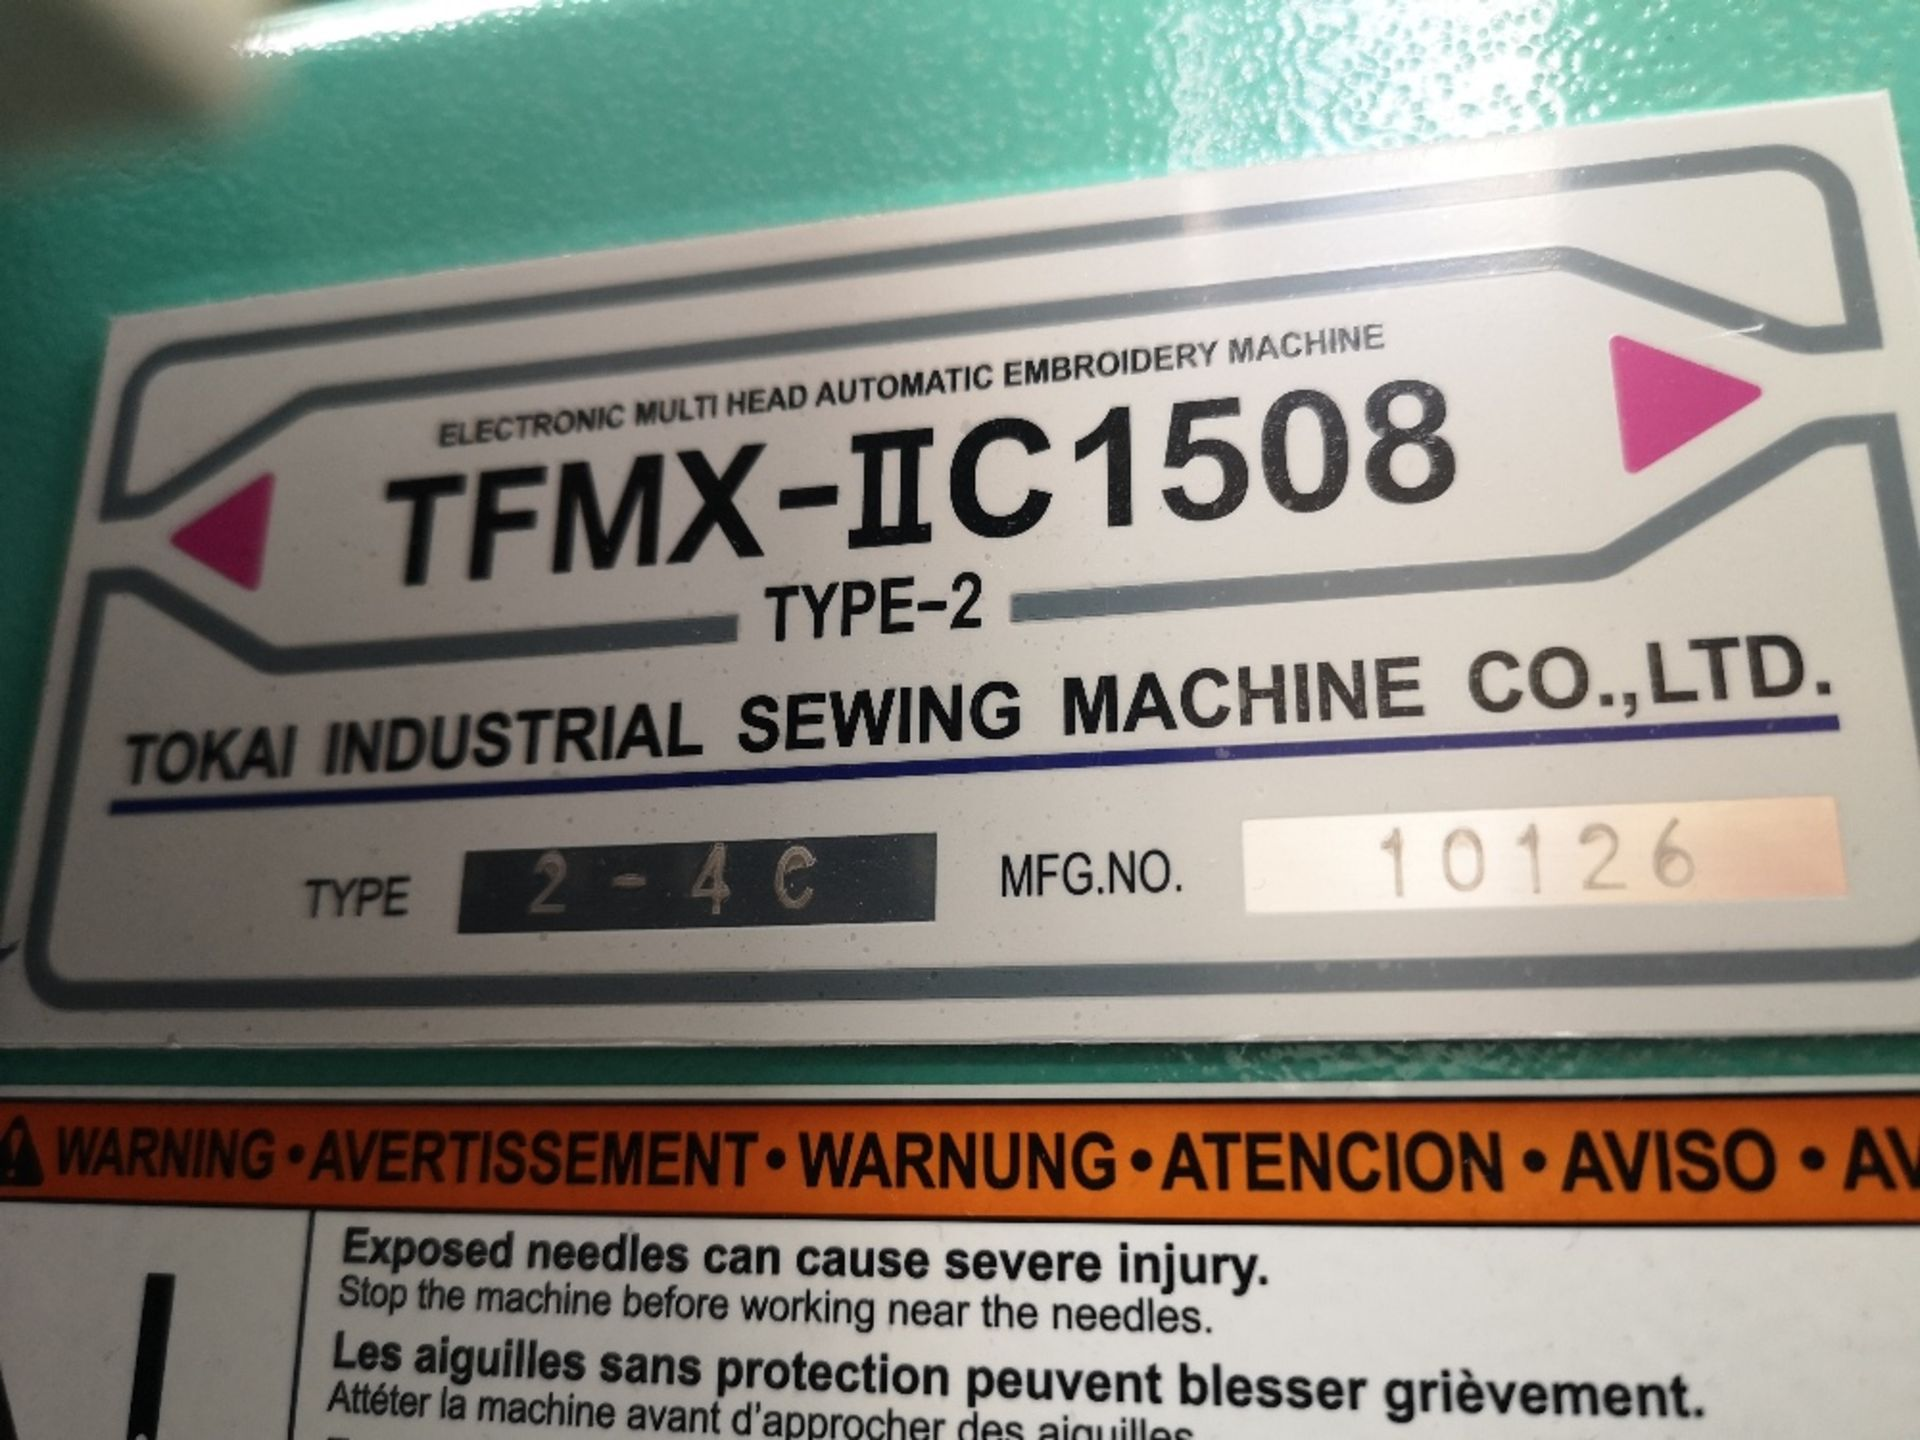 Tajima TFMX-II C1508 Electronic Multi Head Automatic Embroidery Machine (2017) - Image 8 of 12